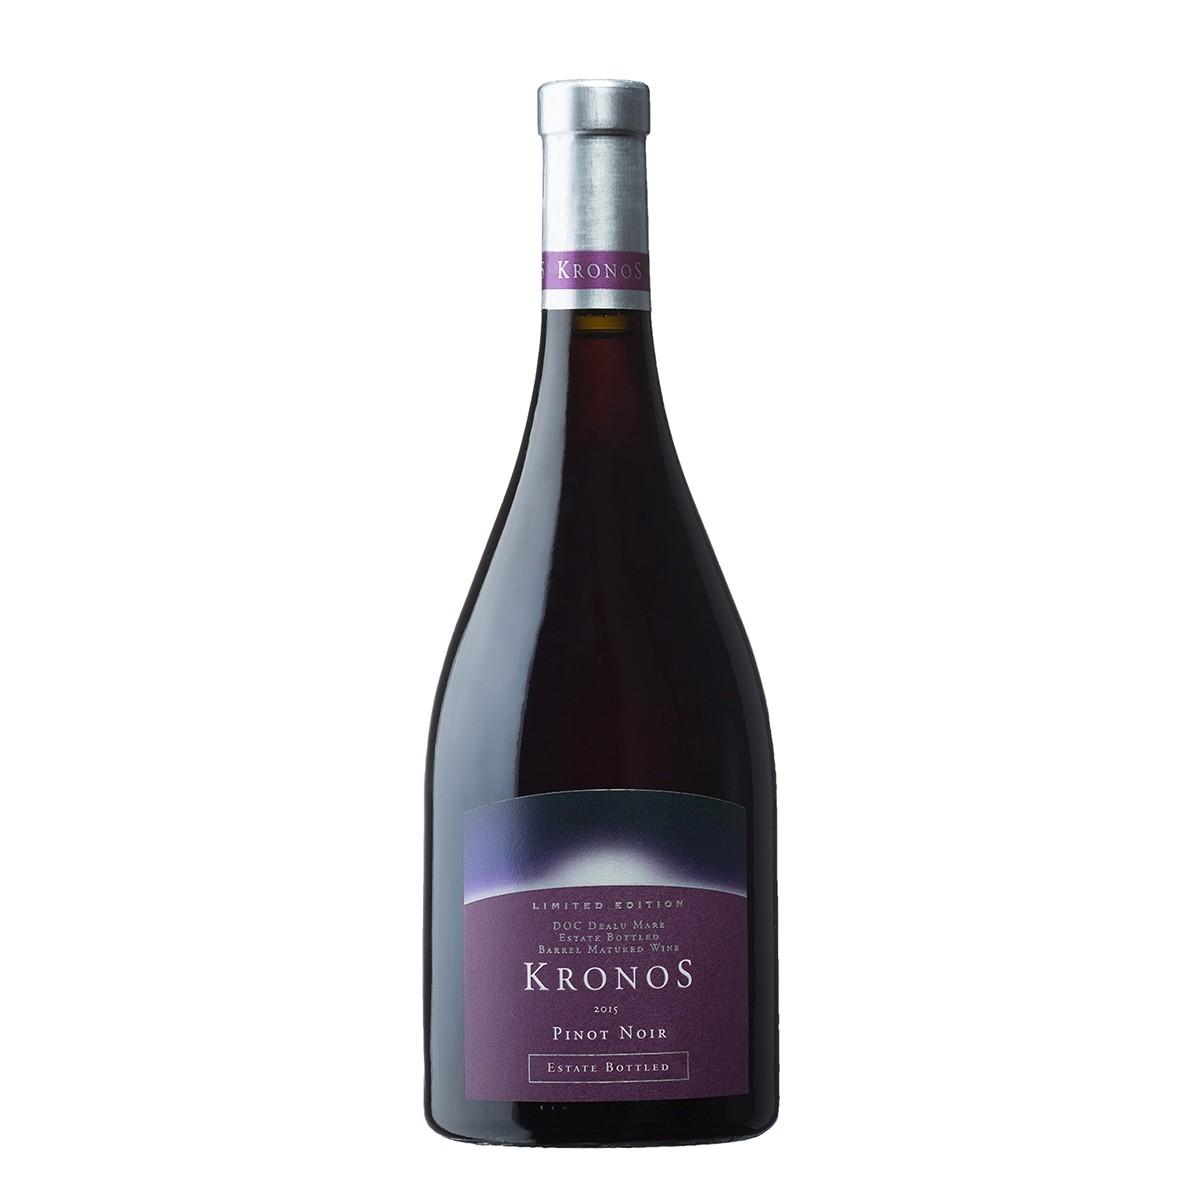 Kronos Pinot Noir